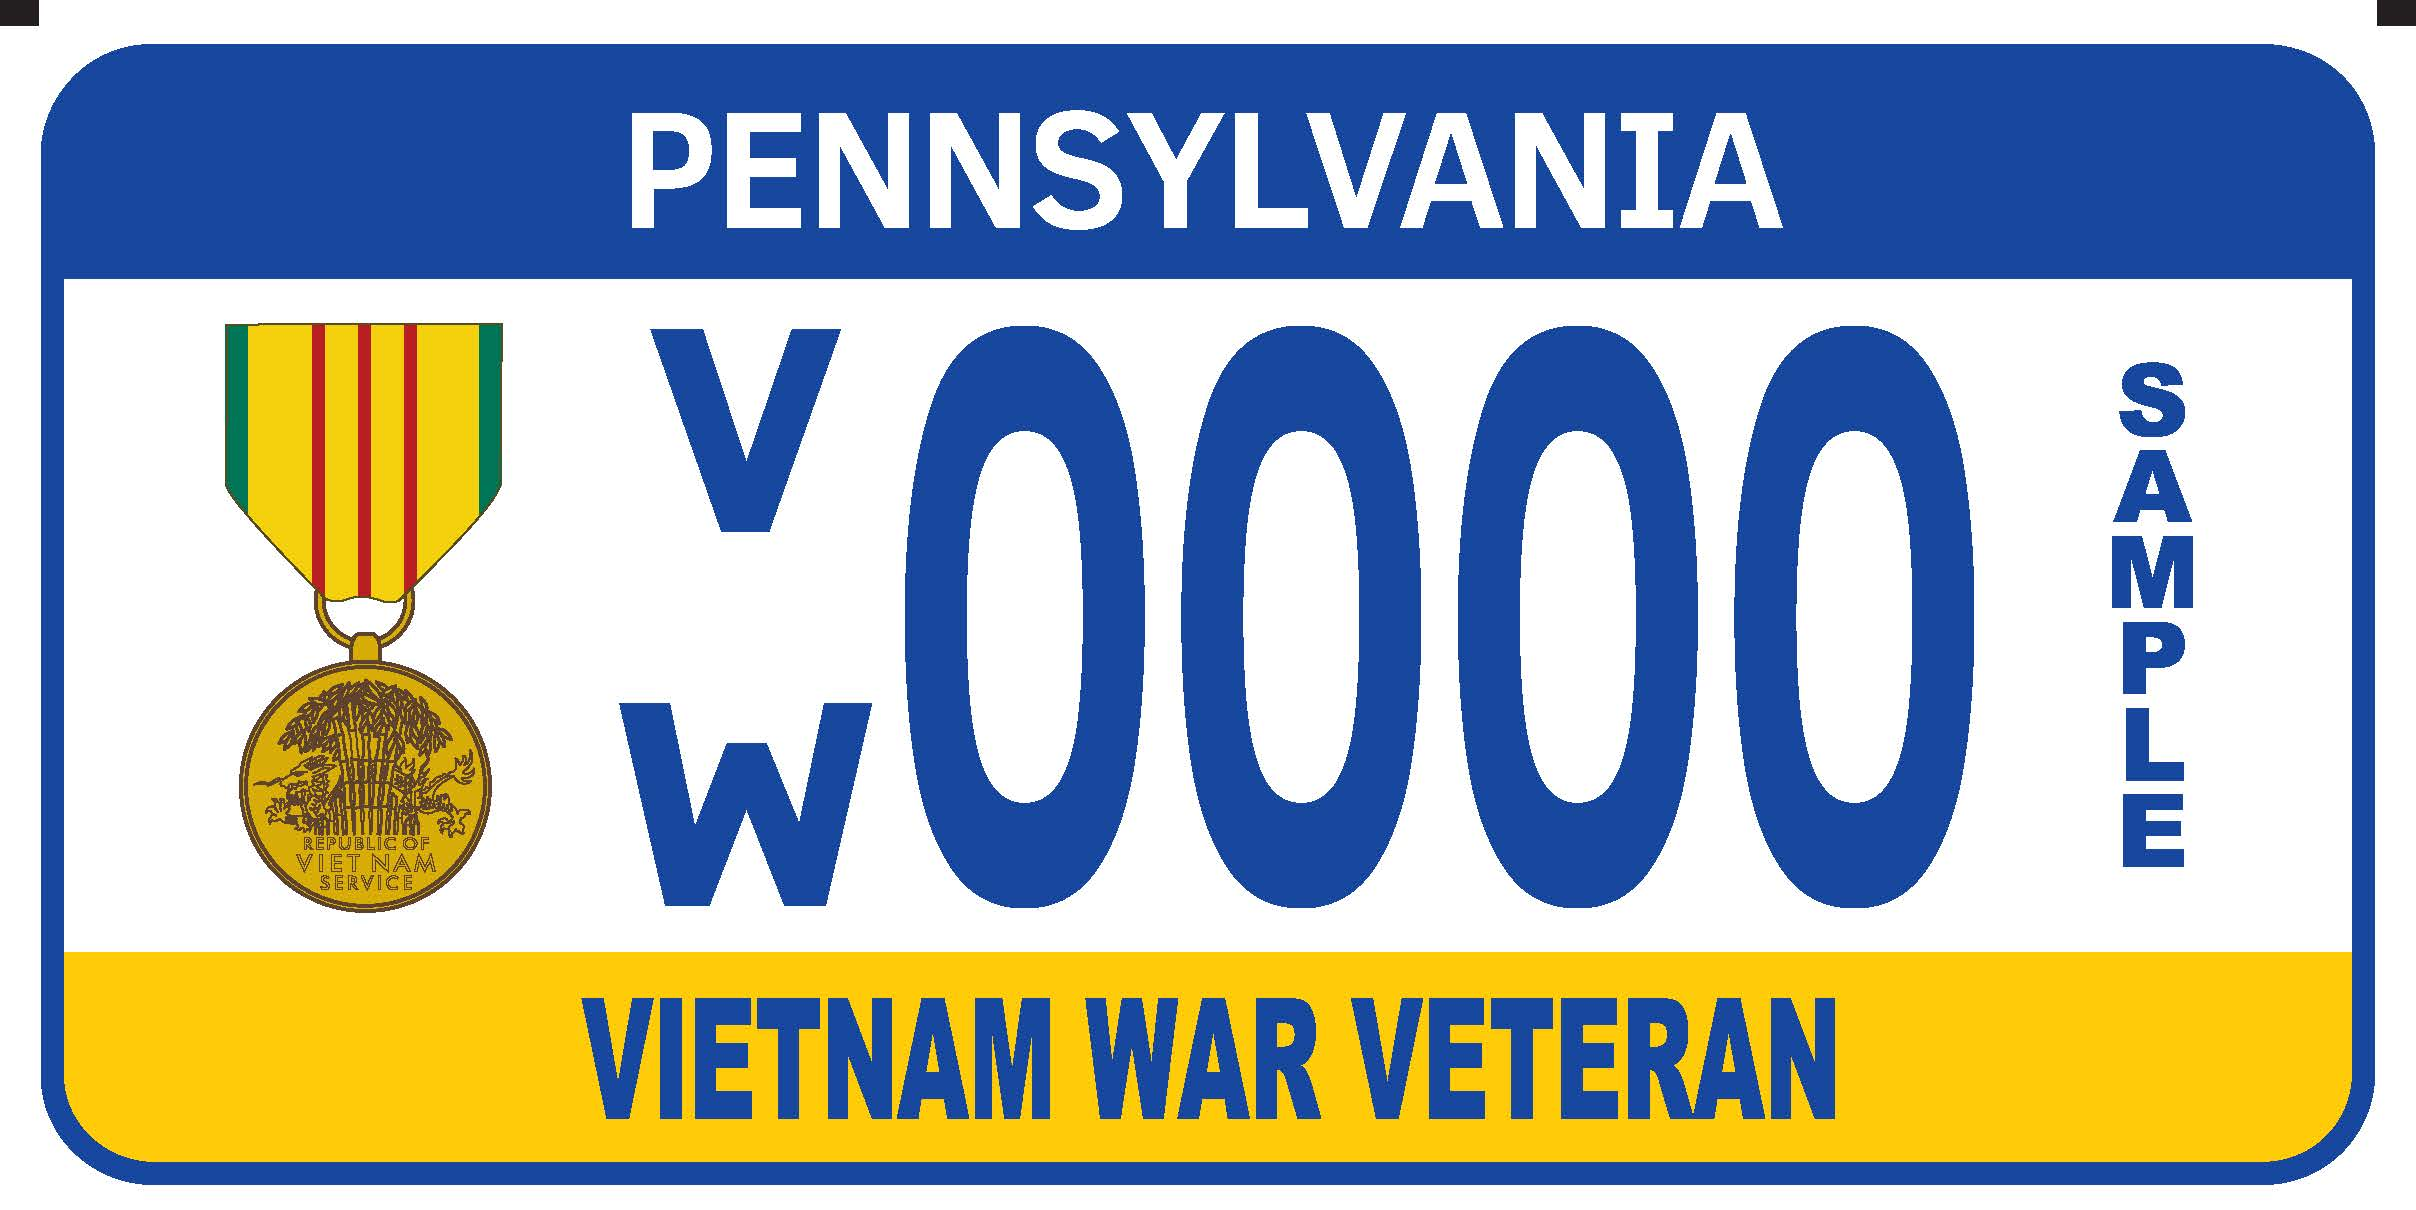 Military Registration Plates